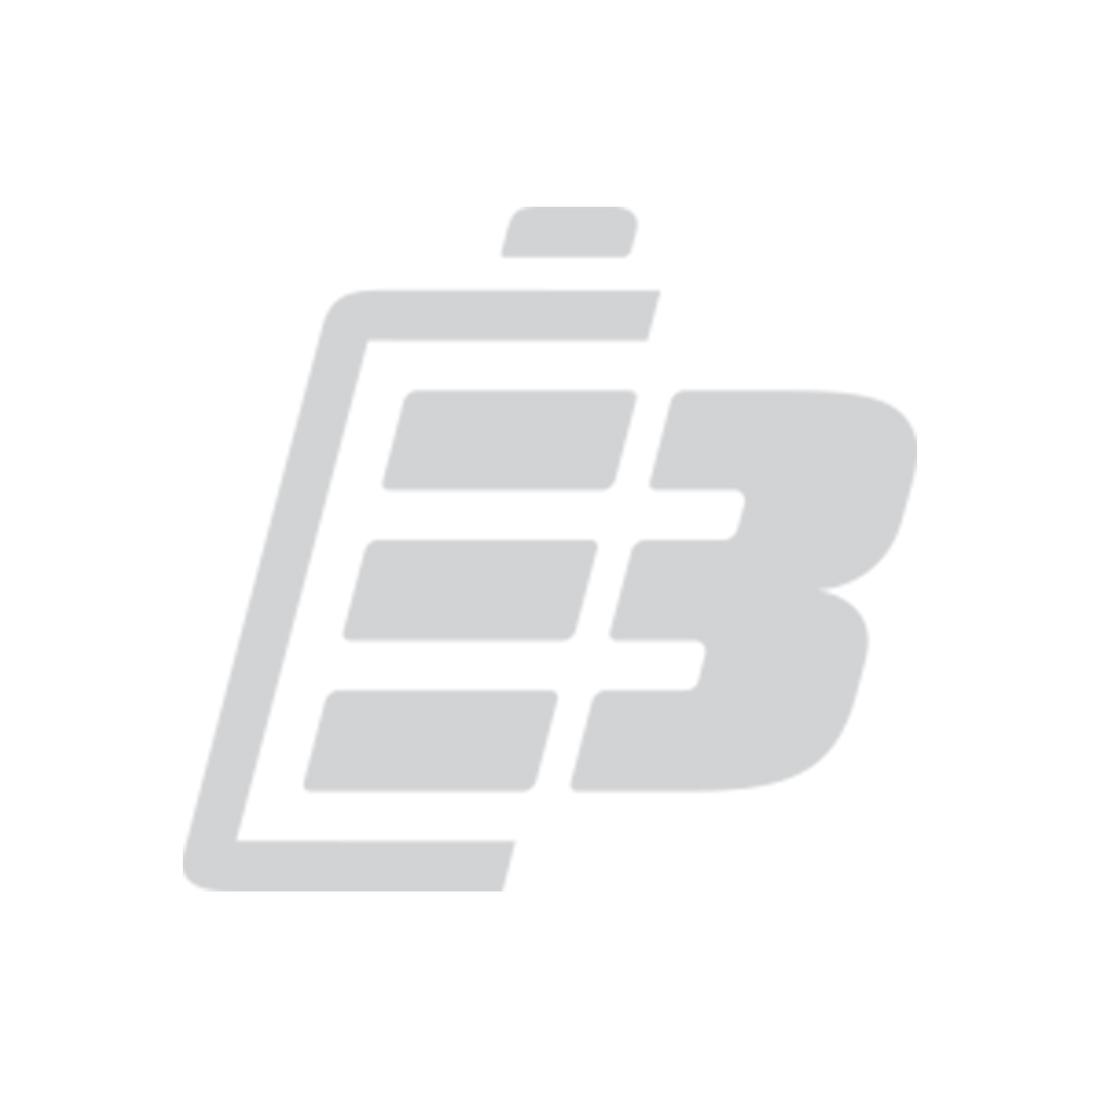 Laptop battery Fujitsu Siemens Esprimo Mobile V5535_1